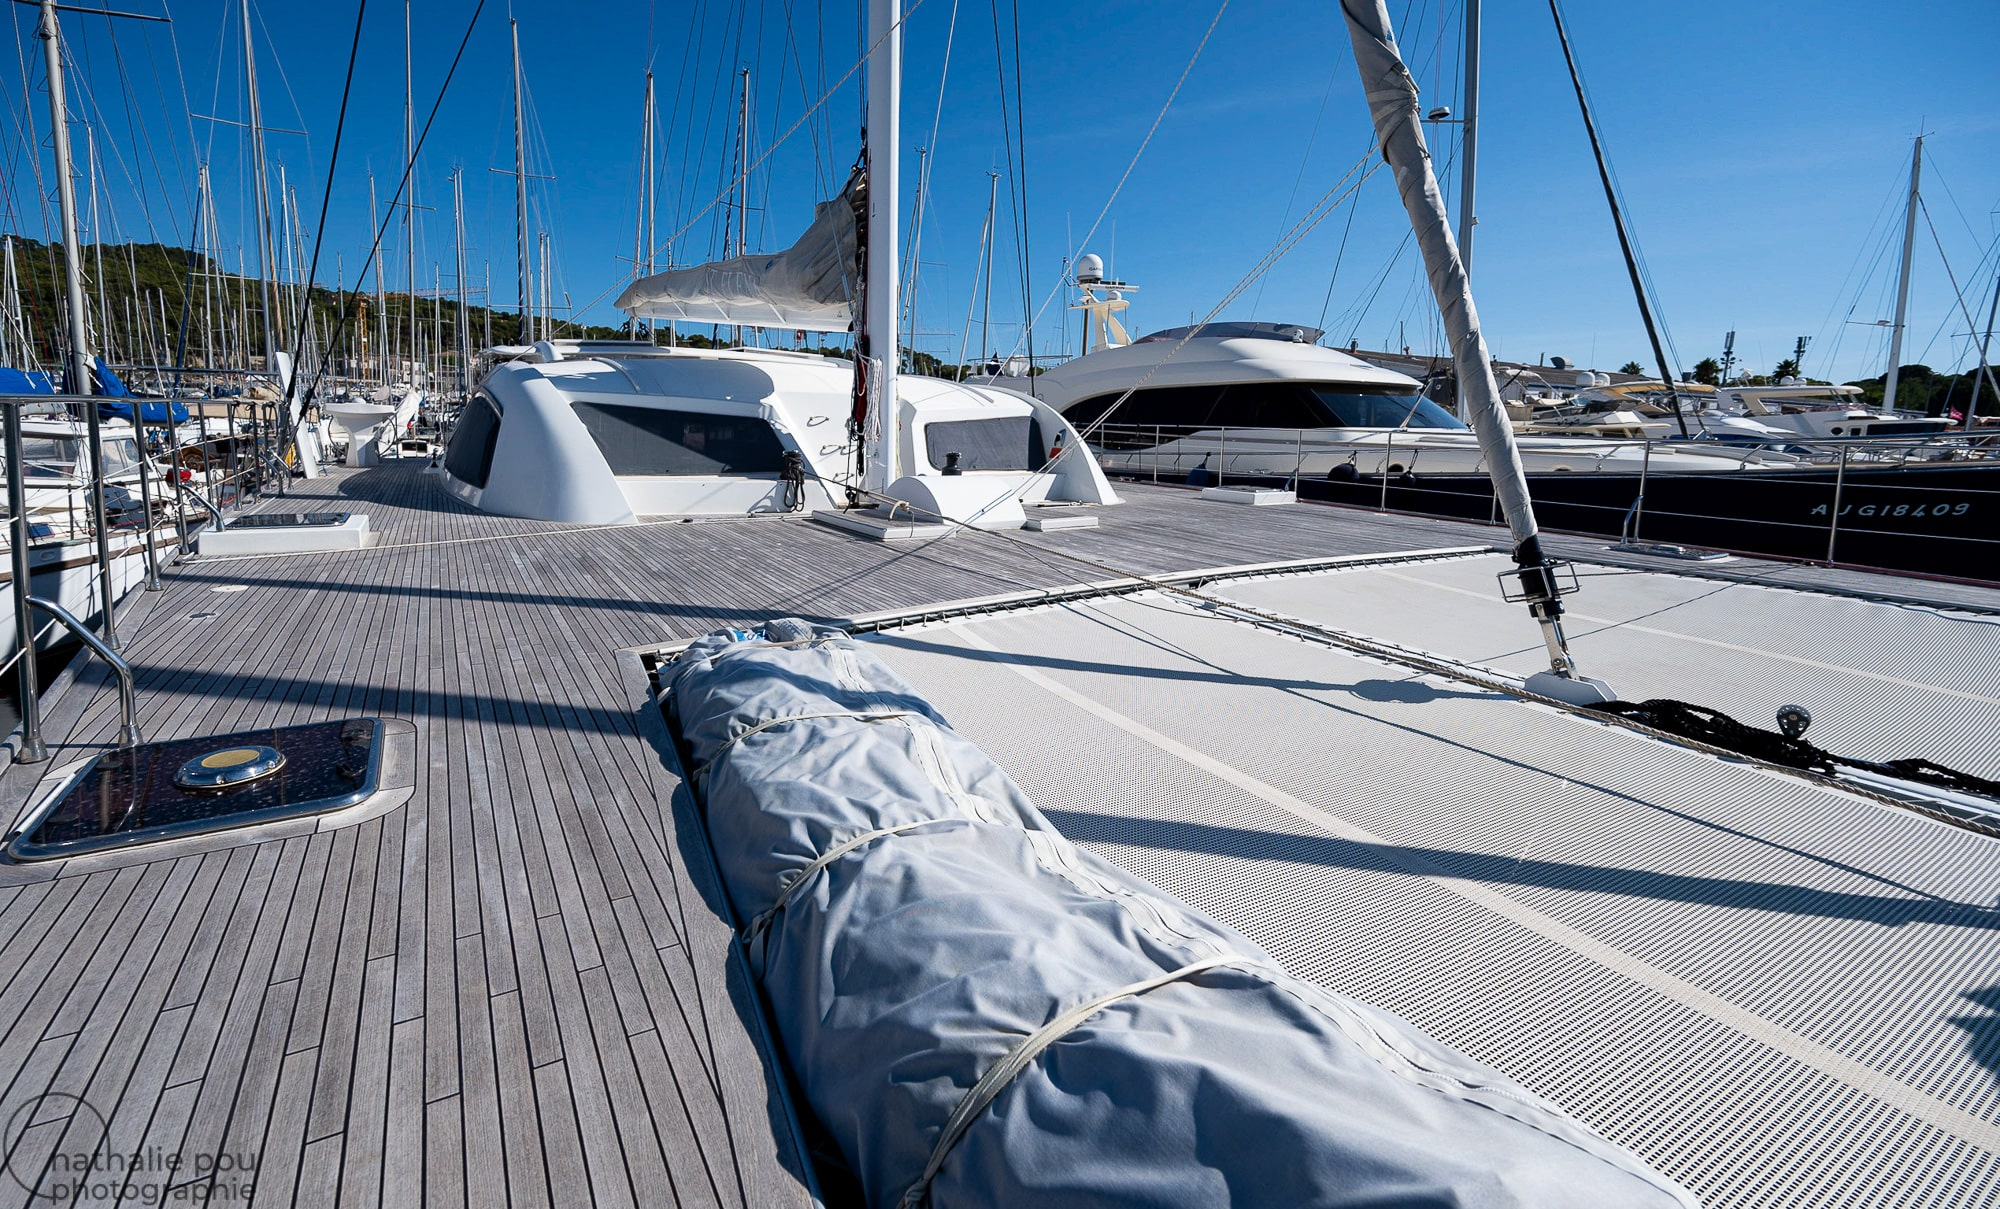 Photographe Yachting: Taïna by Catana - Port Pin Rolland Saint Mandrier